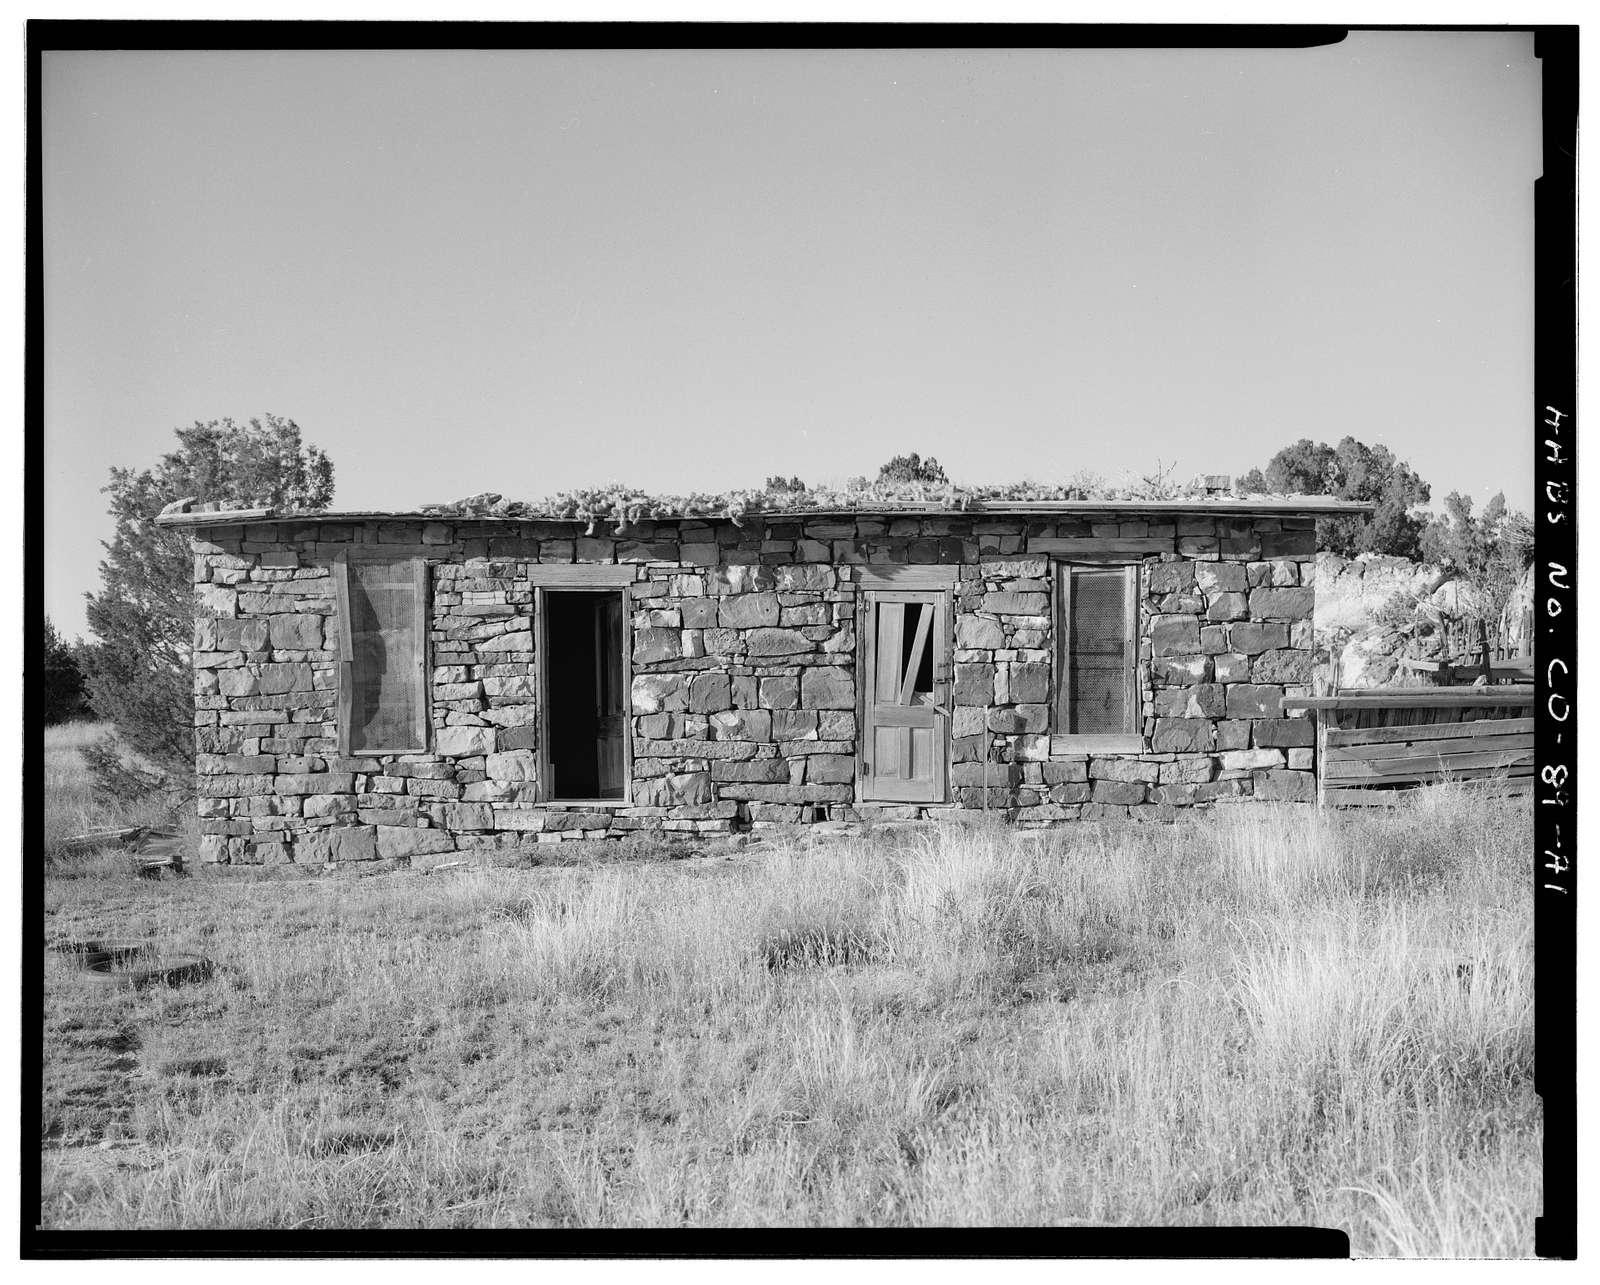 Adam & Bessie Arnet Homestead, Marguerite Arnet Residence, 560 feet northeast of Adam & Bessie Arnet Residence, Model, Las Animas County, CO